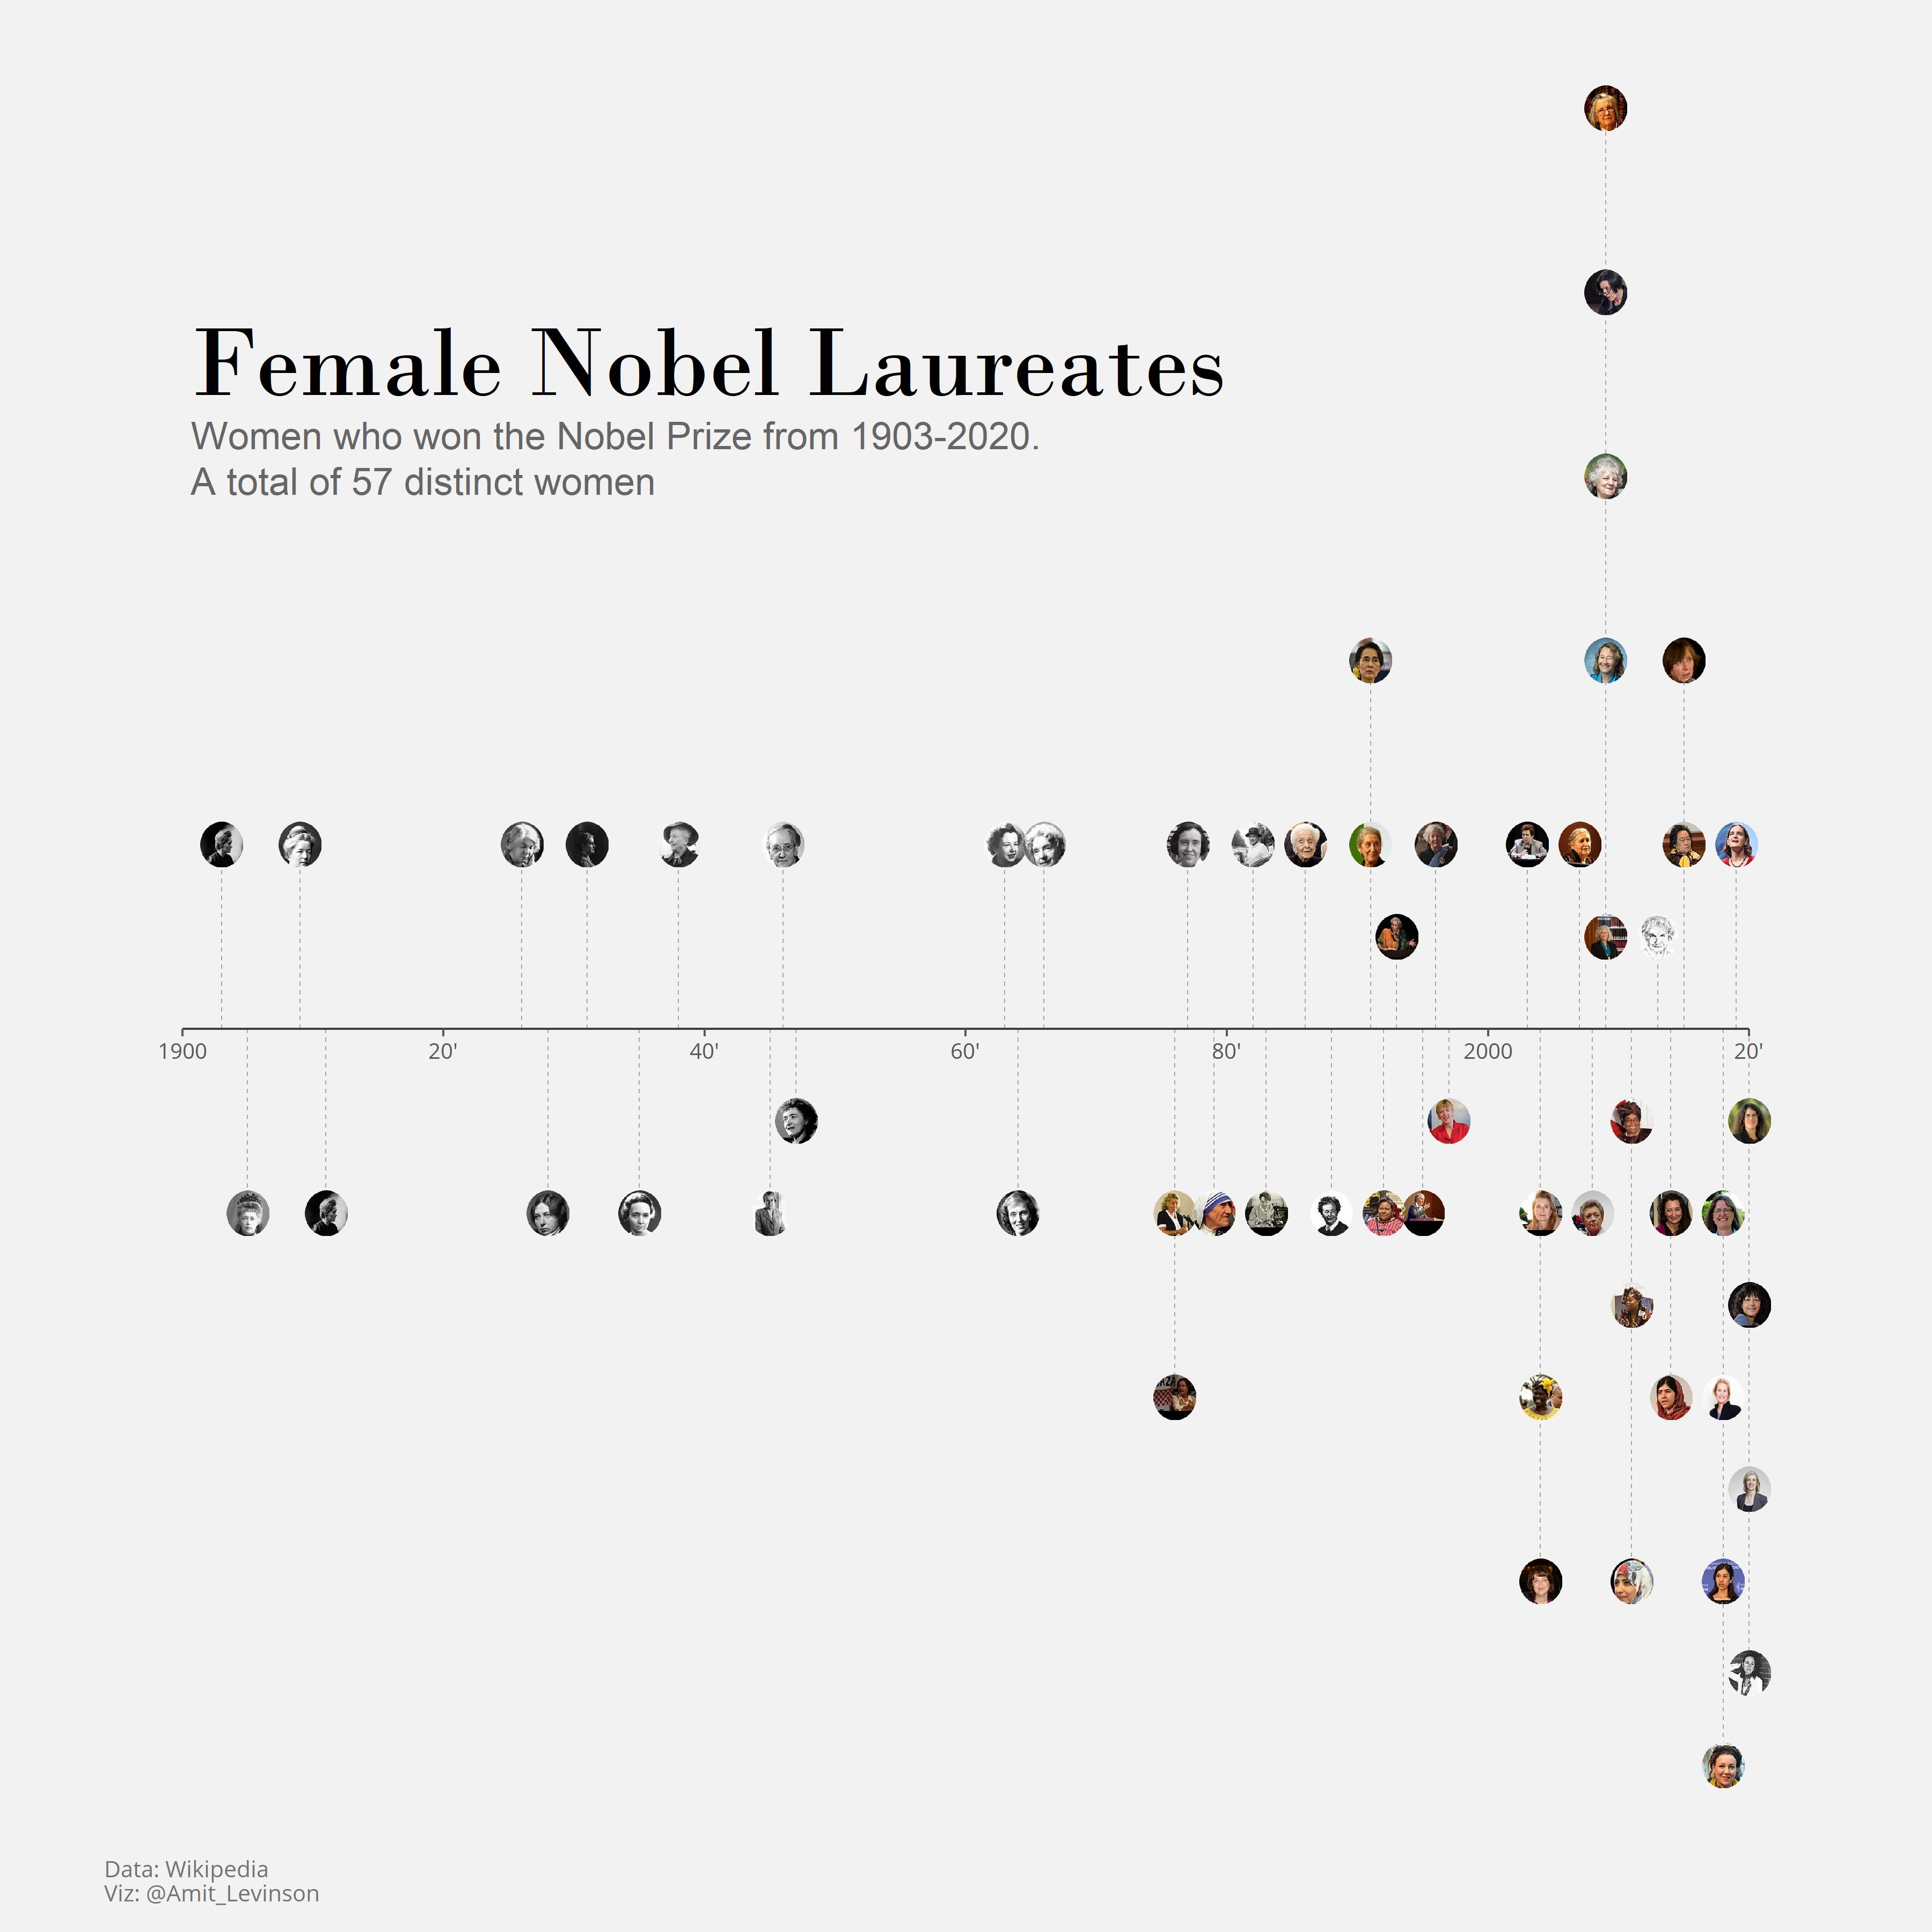 Visualization showing women who won the Nobel prize